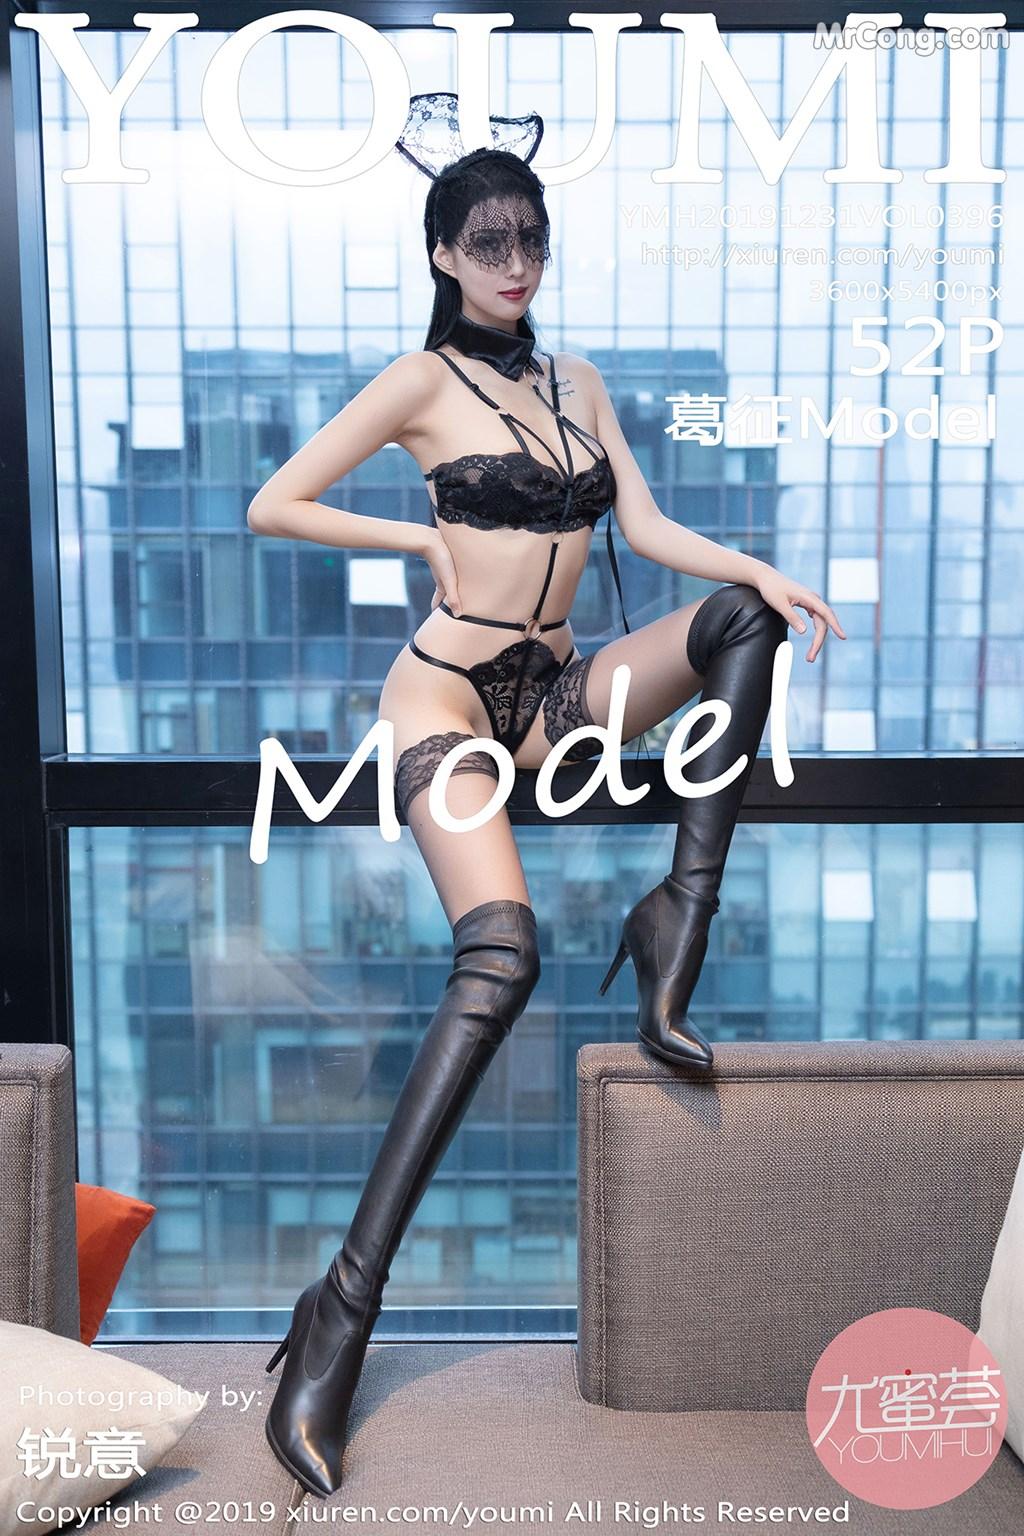 YouMi Vol.396: 葛 征 Model (53 photos)